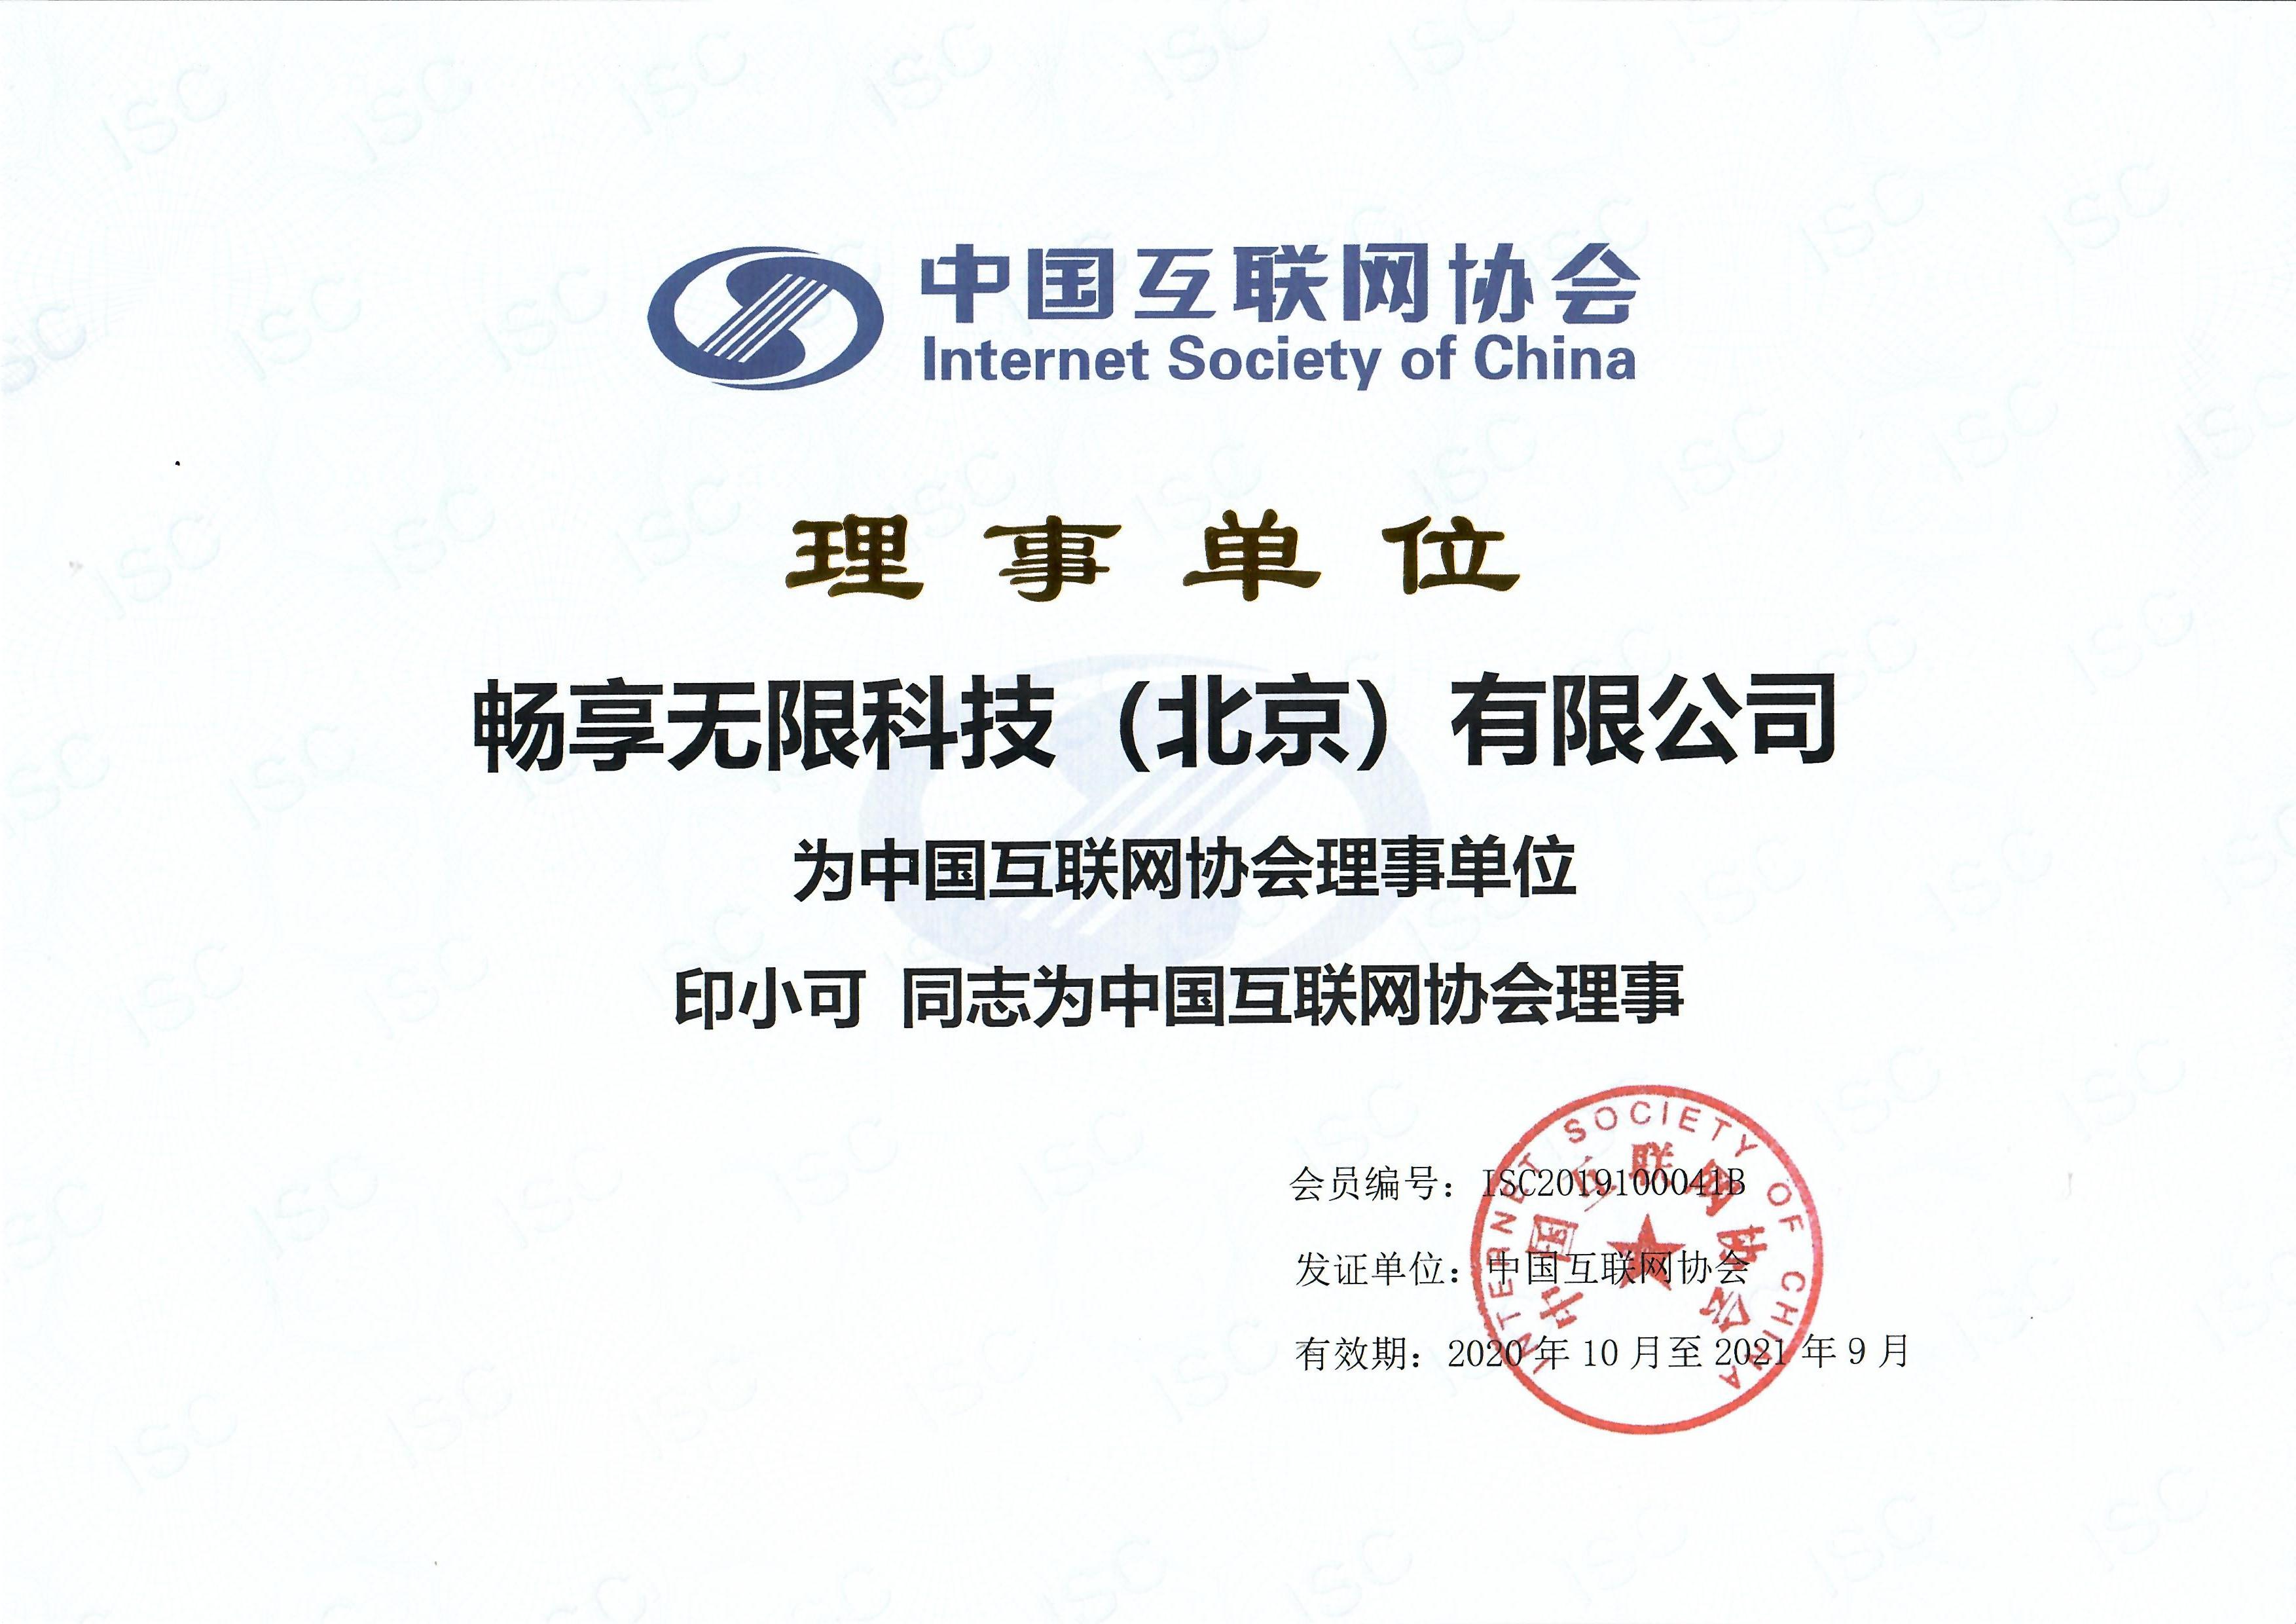 Executive Member of Internet Society of China